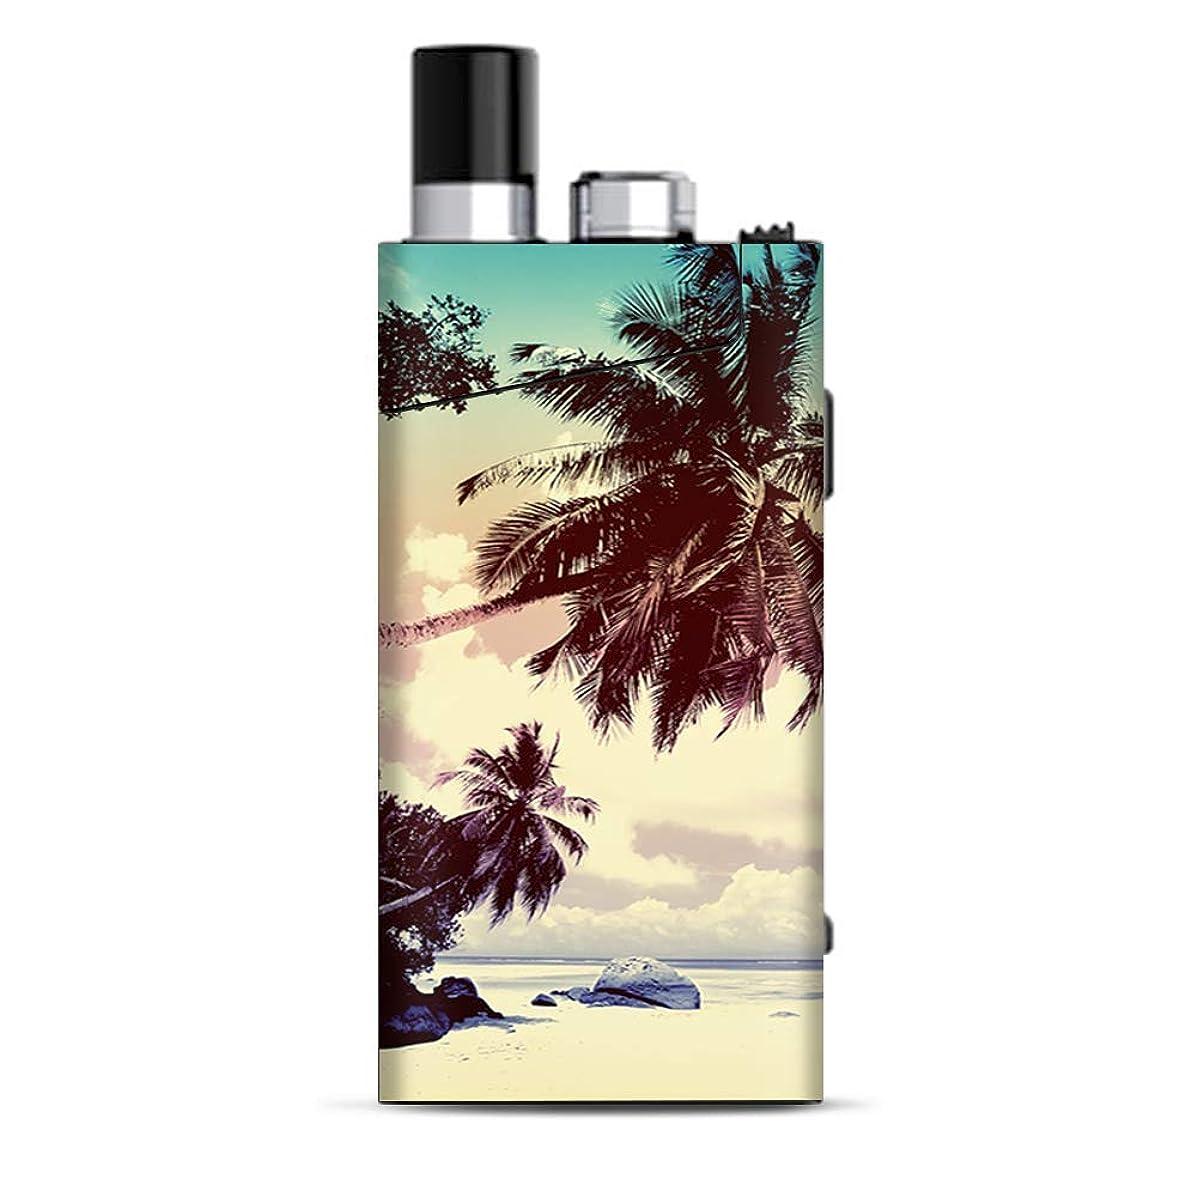 Skin Decal Vinyl Wrap for Smok Trinity Alpha Kit | Vape Stickers Skins Cover| Faded Beach Palm Tree Tropical